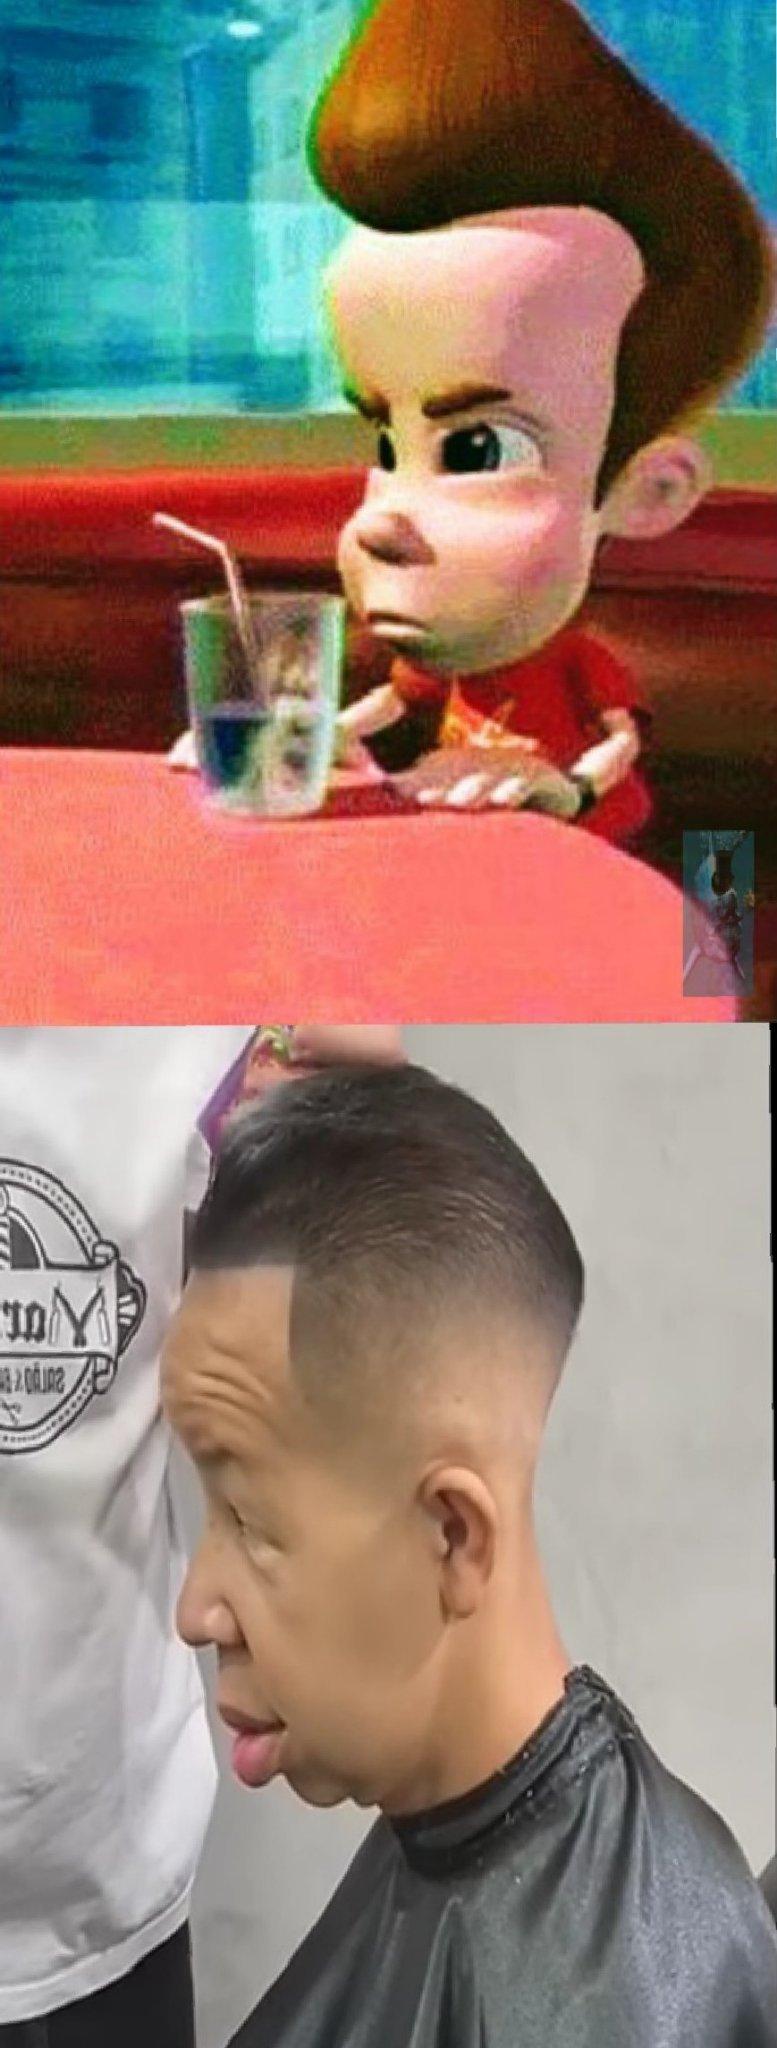 Jimmy neutron tá diferente - meme